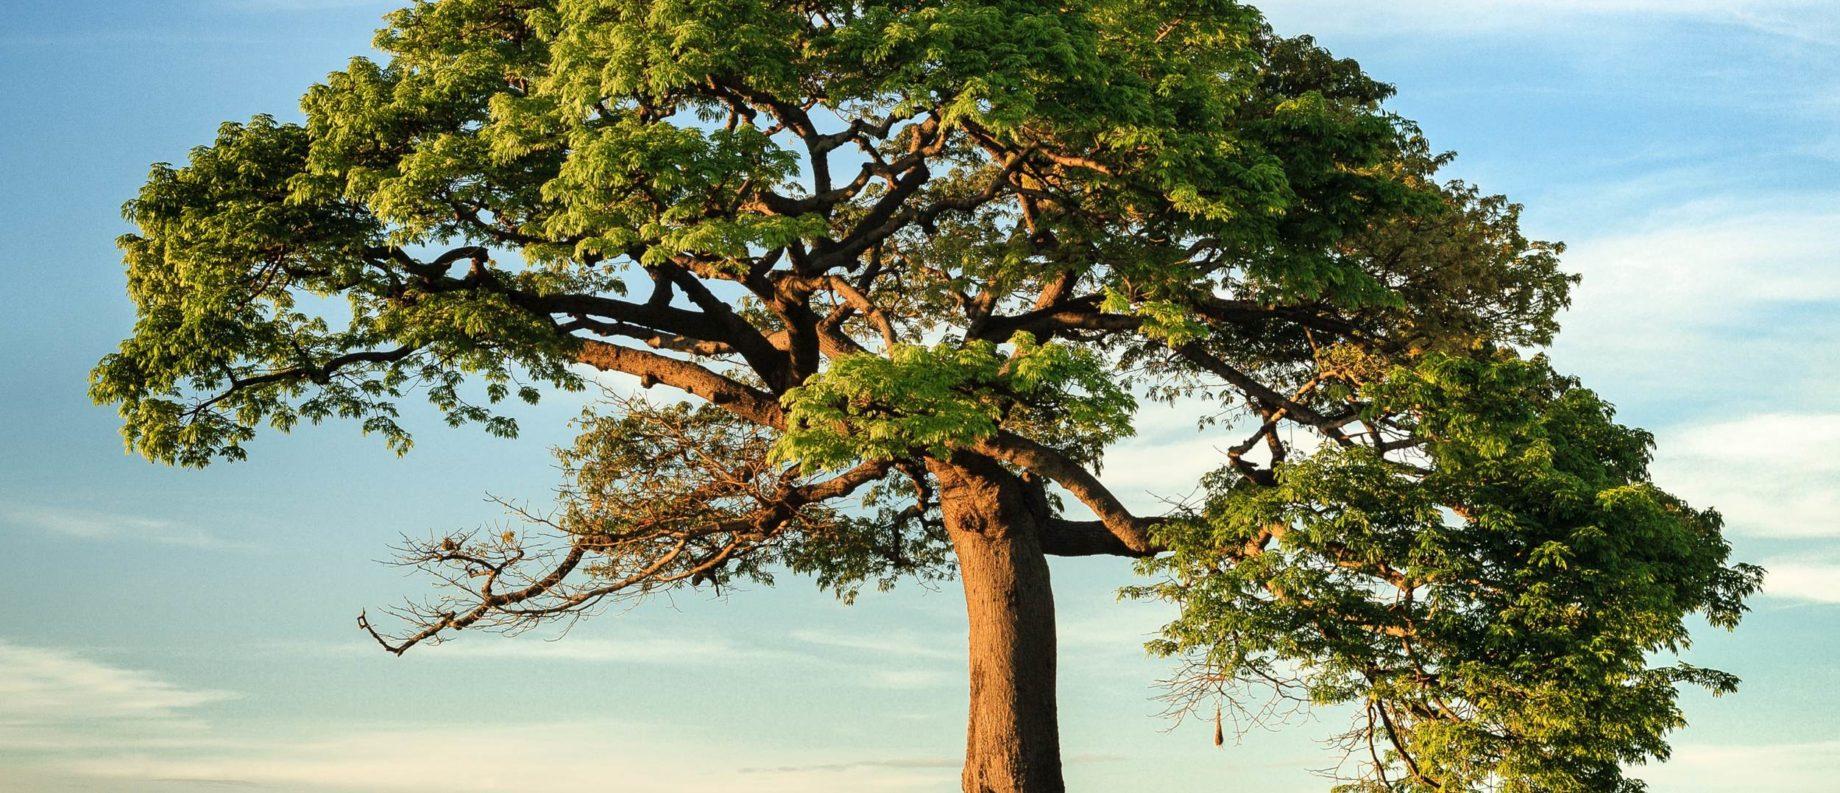 A lone mature tree in the sun